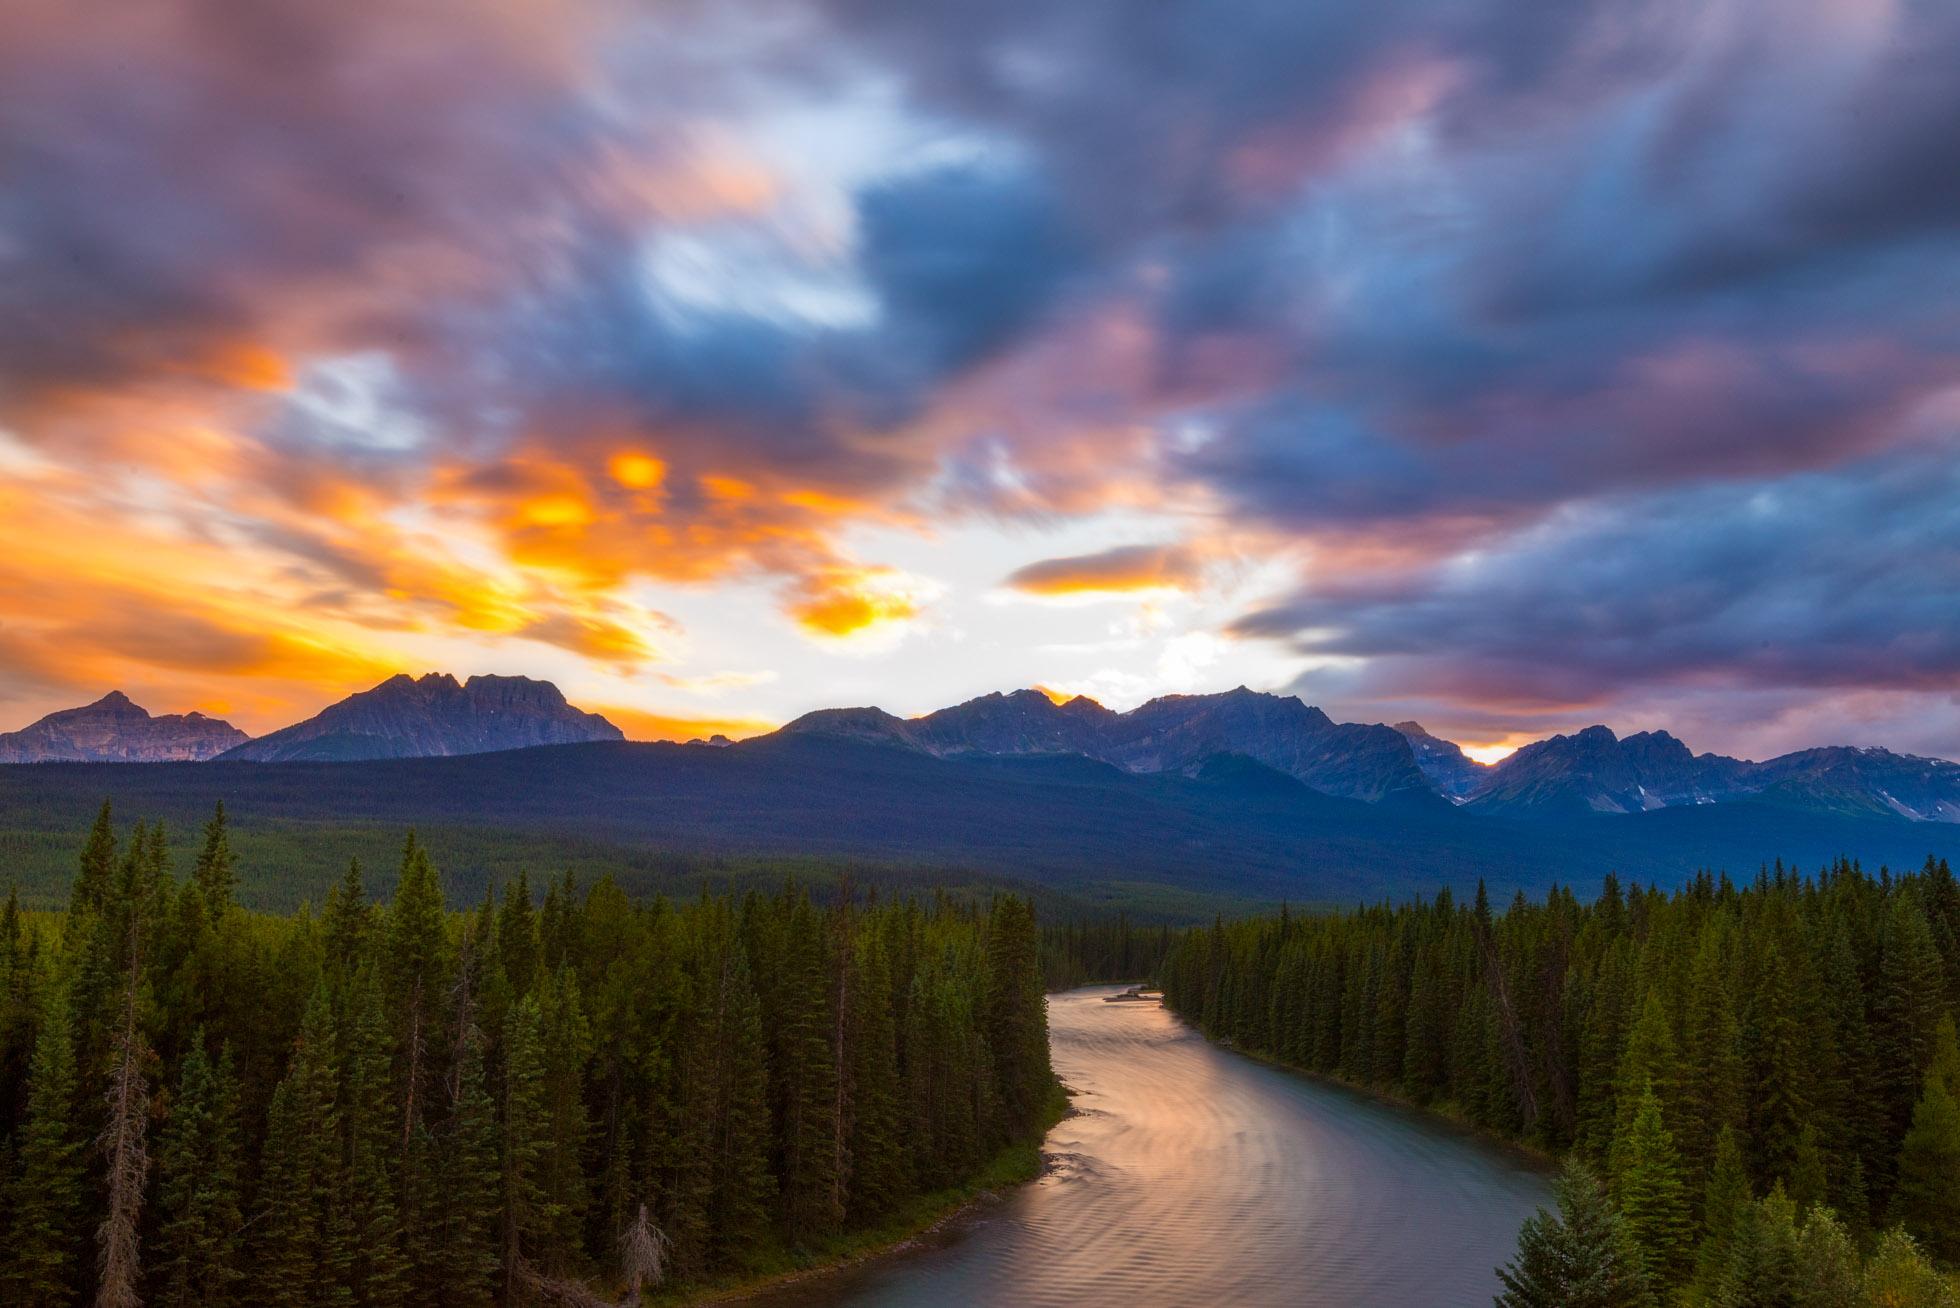 Sunset at Storm Mountain